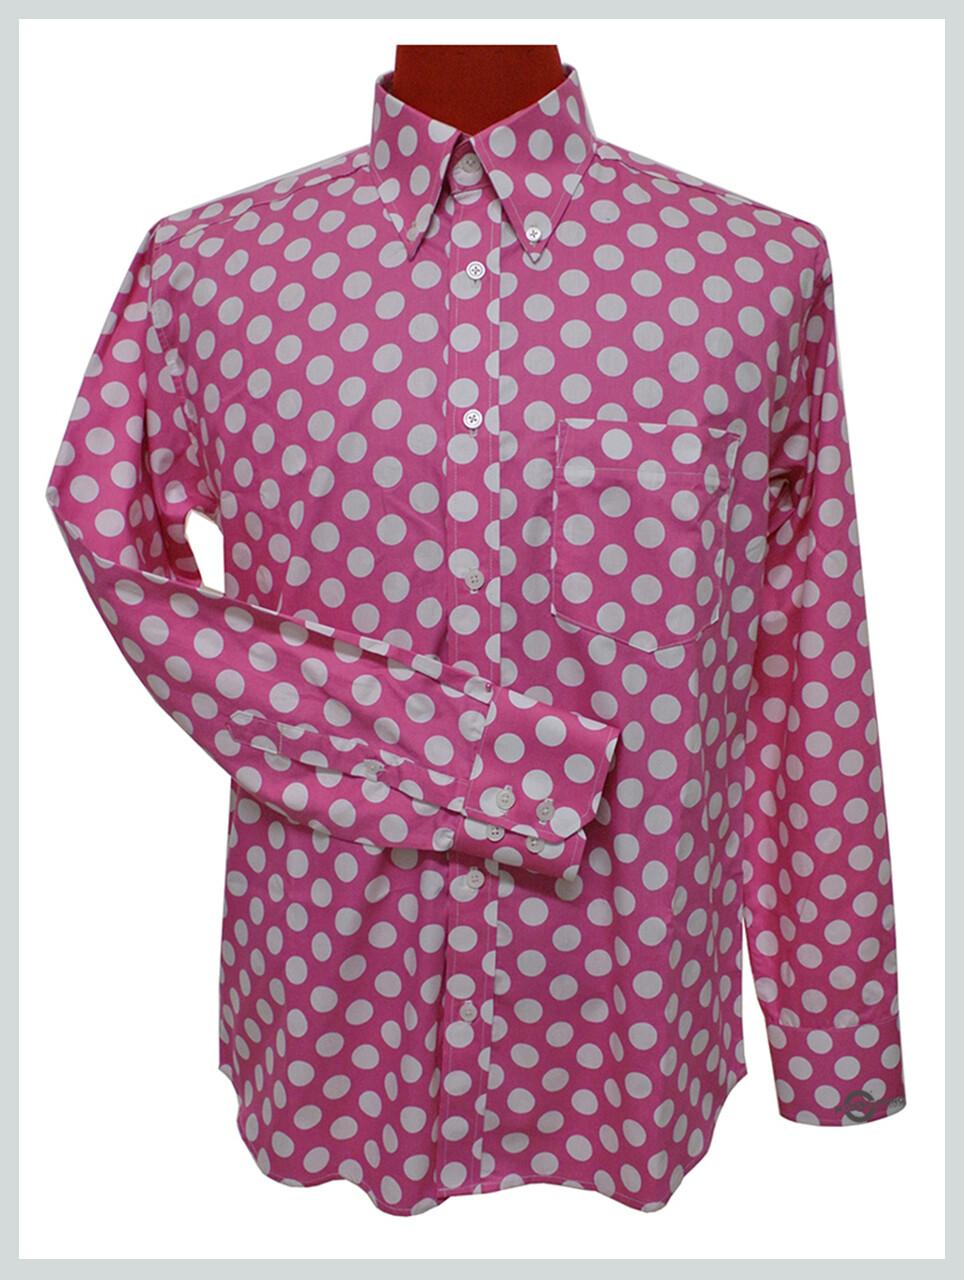 Polka Dot Shirt| Mens Slim Fit White Dot In Light Pink Shirt